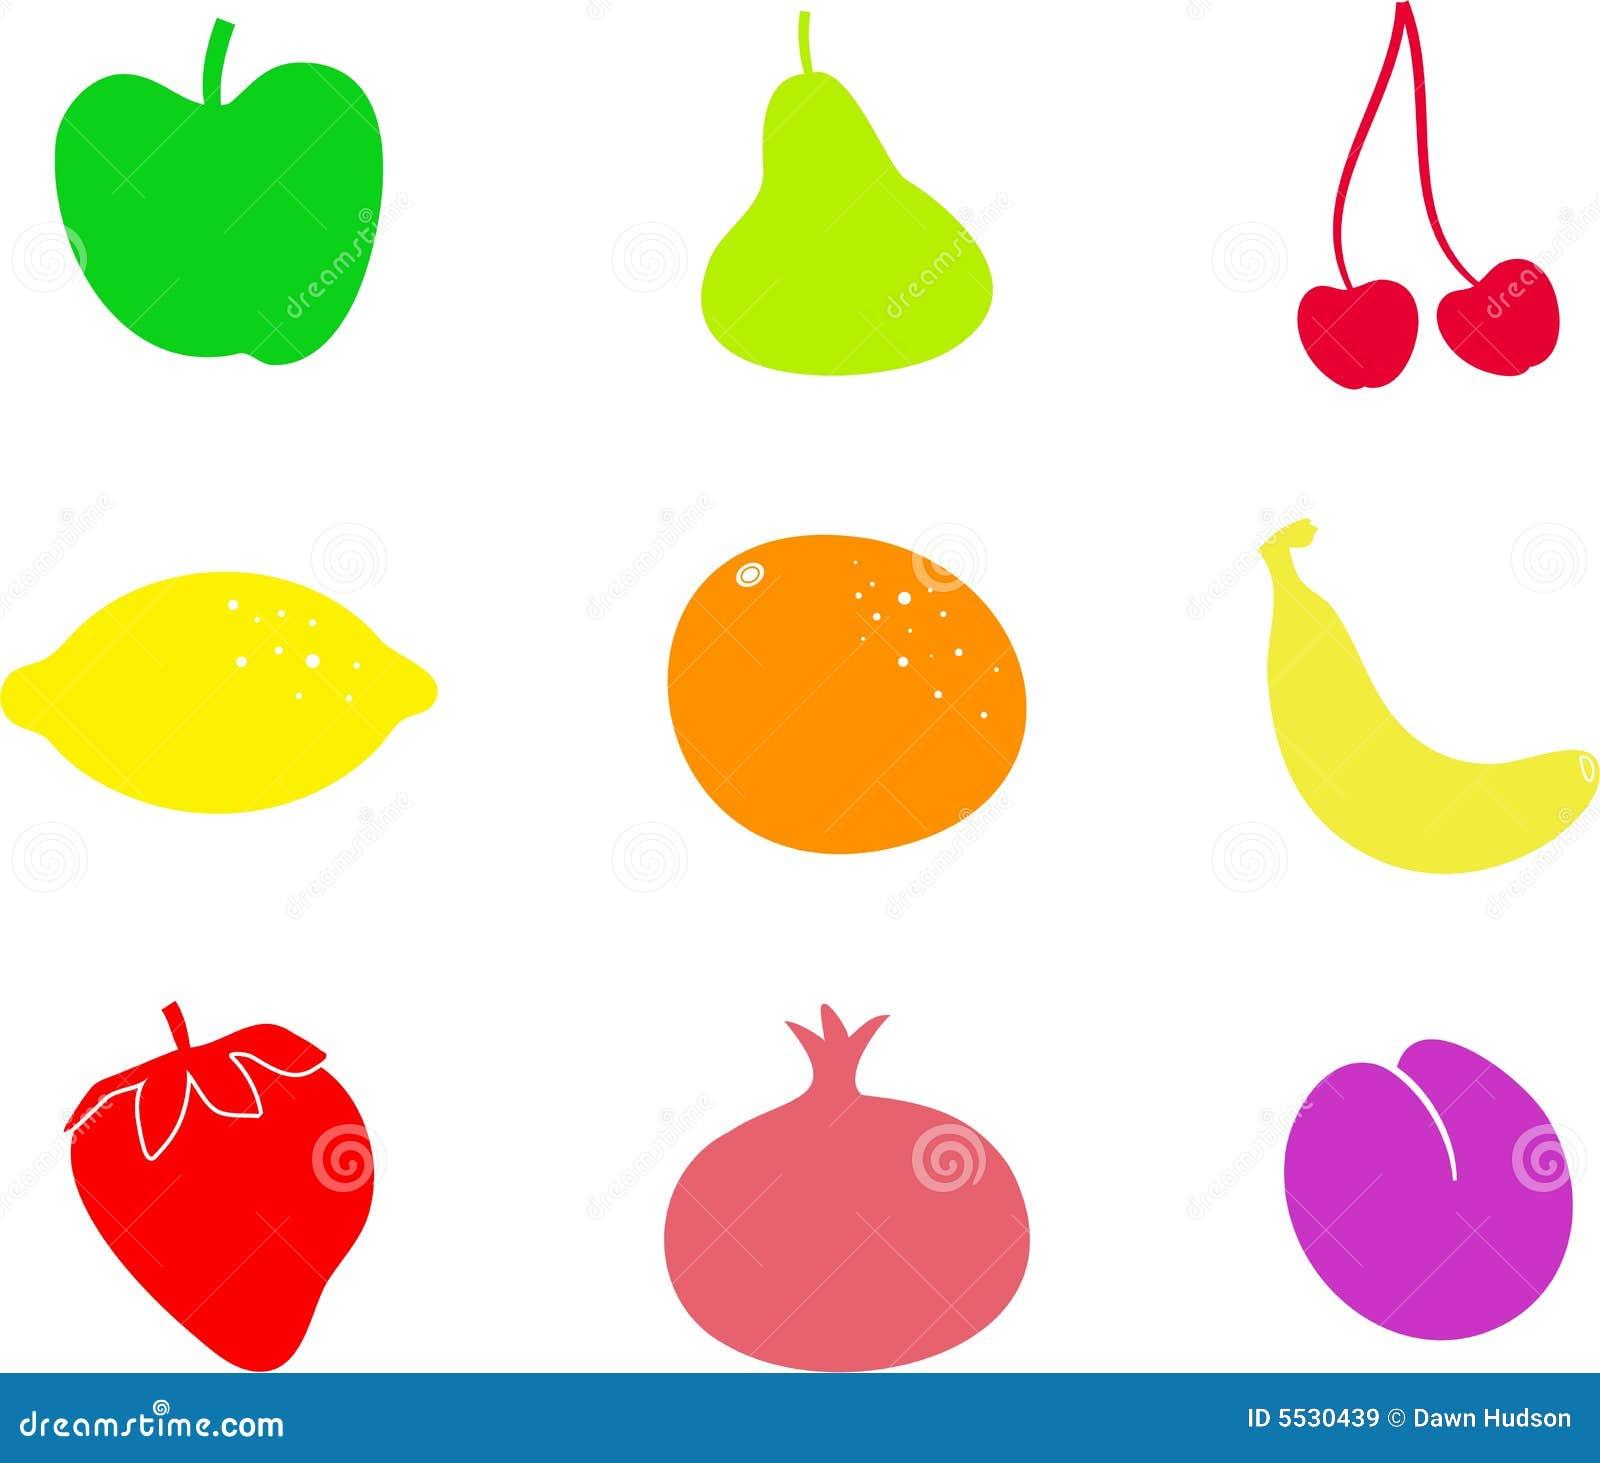 Fruit Shapes Royalty Free Stock Images - Image: 5530439